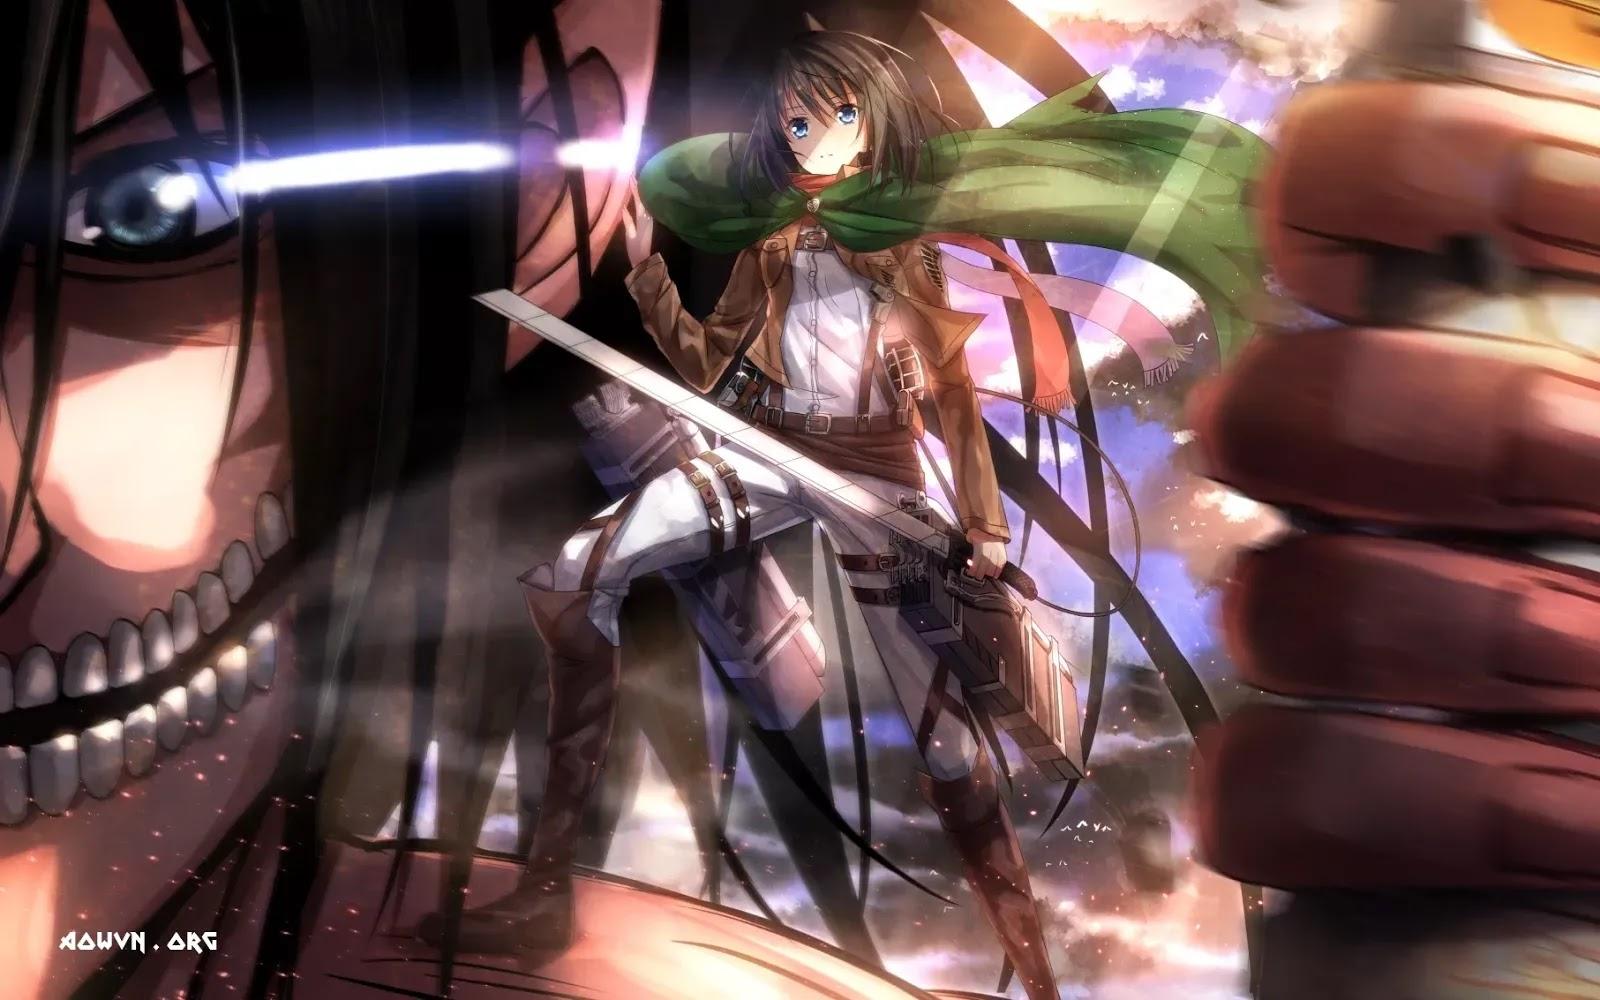 AowVN.org minz%2B%25284%2529 - [ Anime 3gp Mp4 ] Attack On Titan TV & Bluray SS1 + SS2 | Vietsub - Shingeki No Kyojin